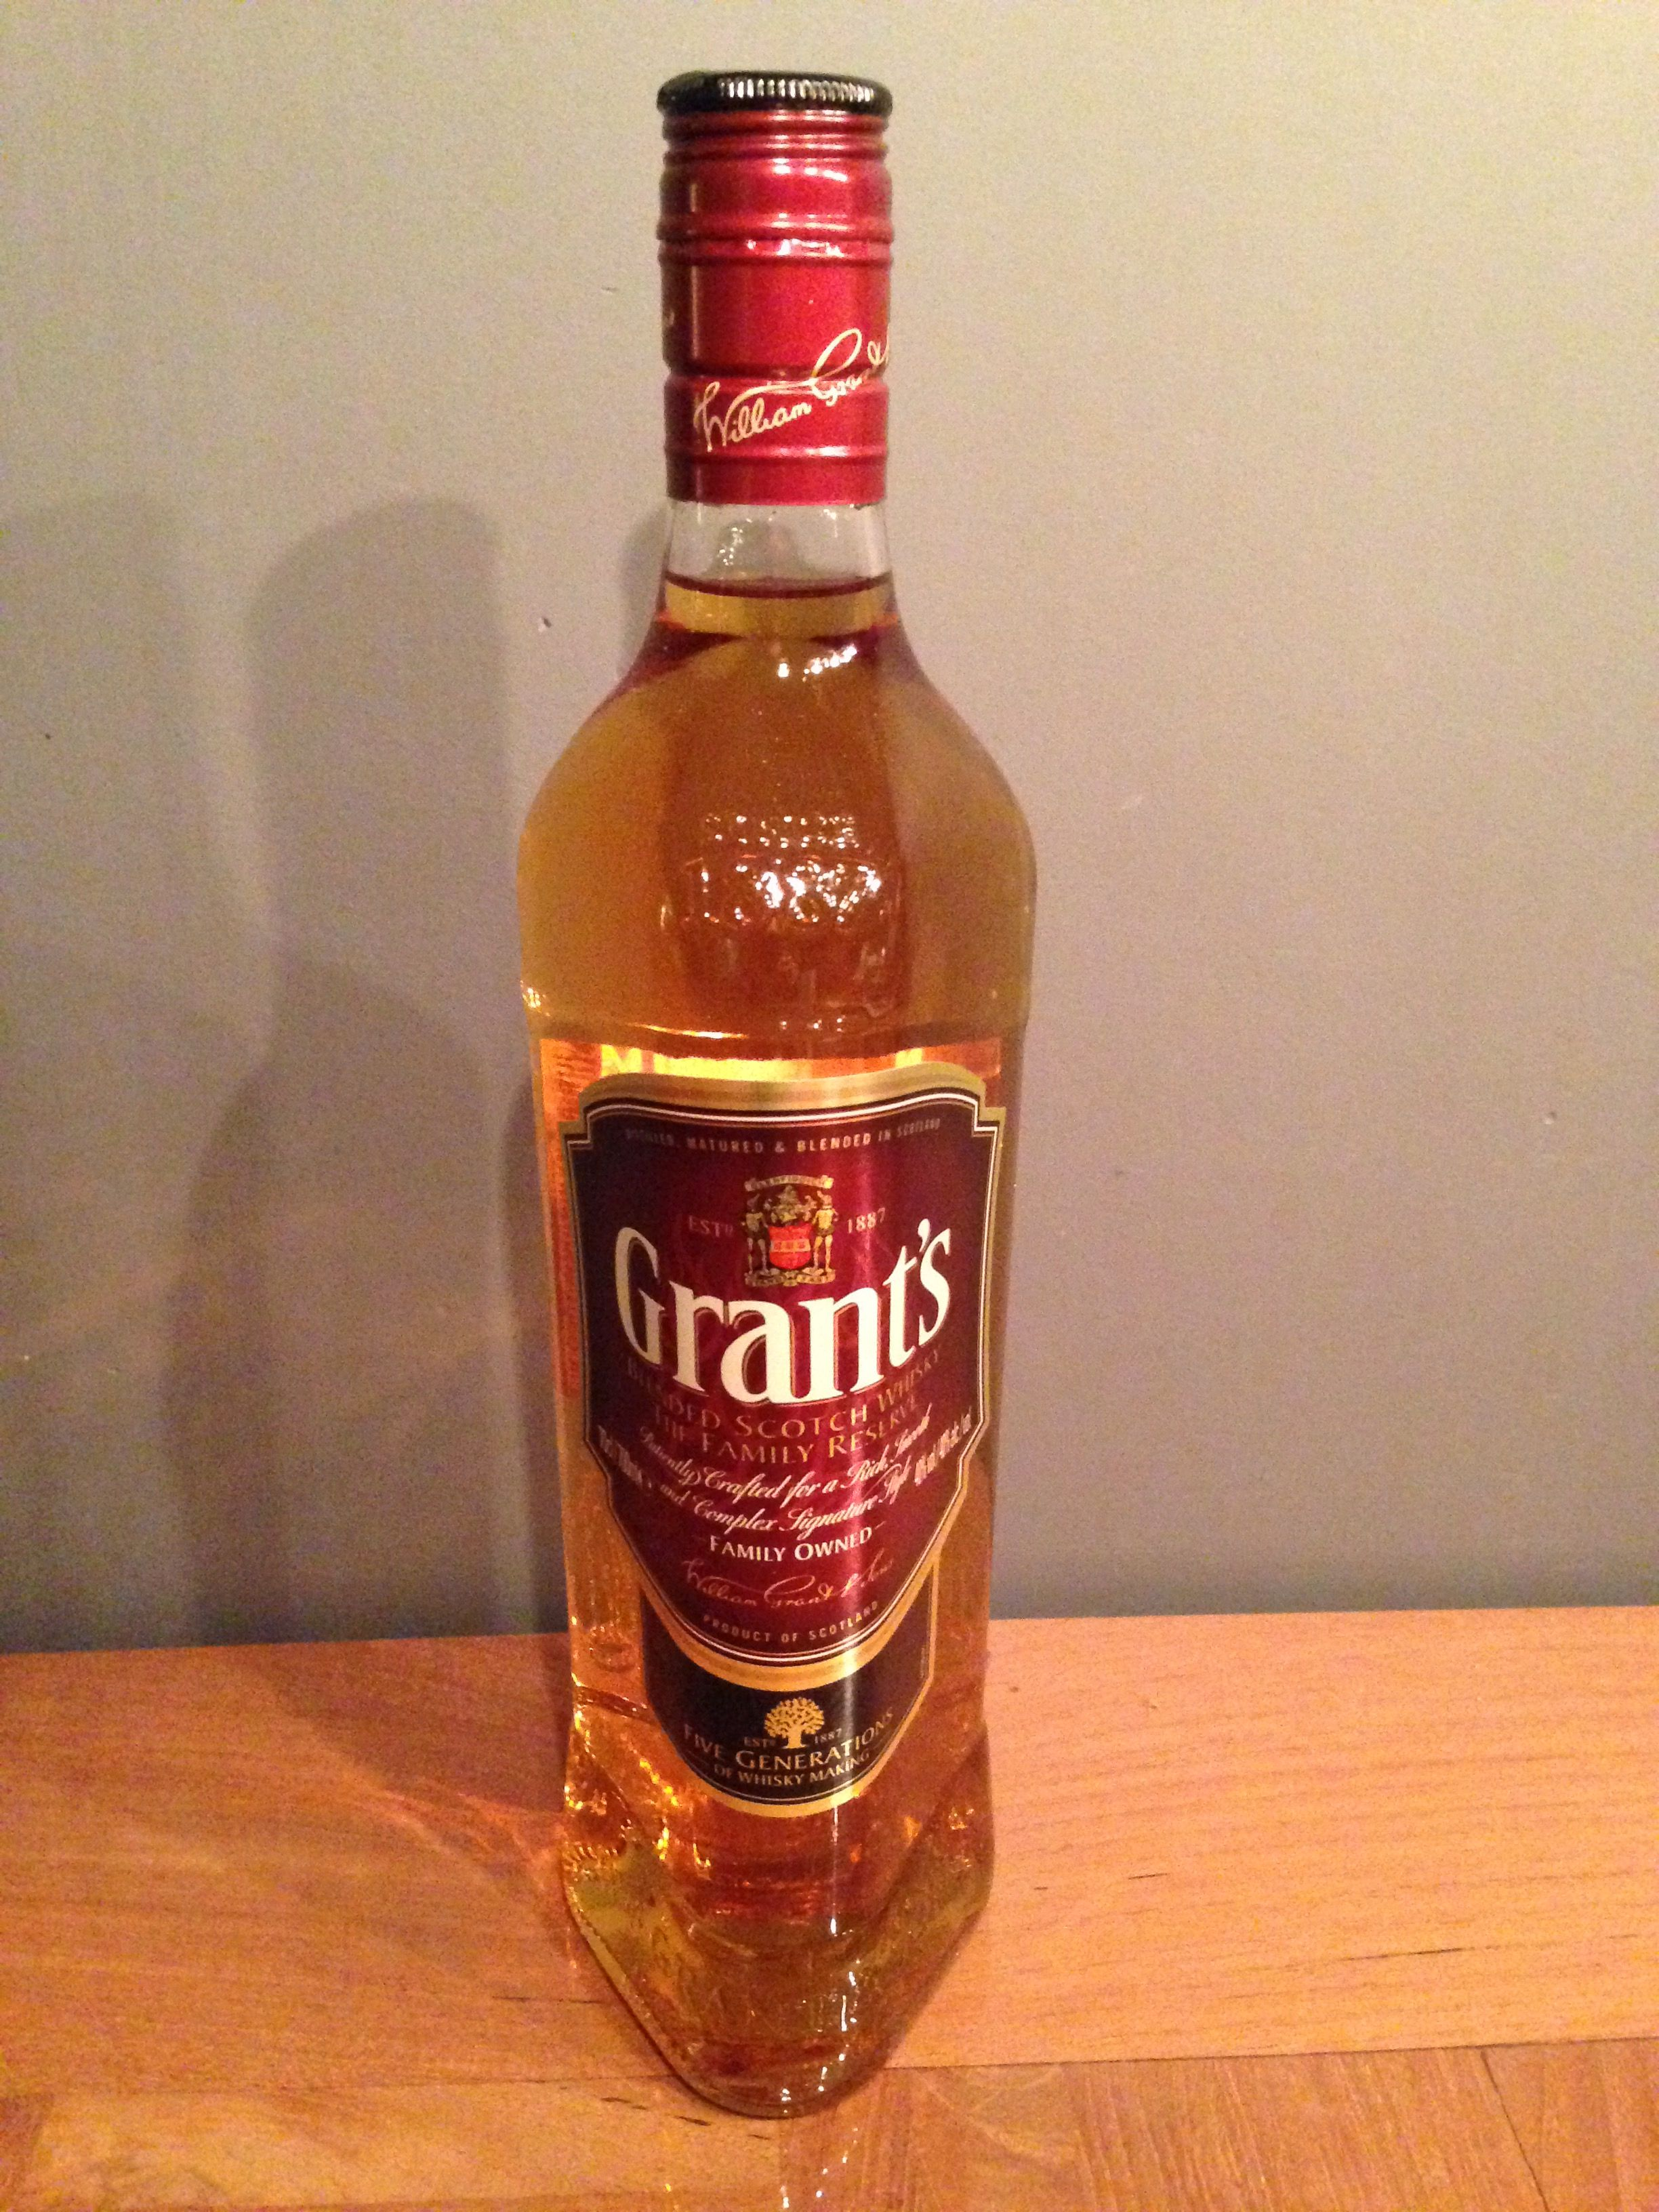 Grant El Cheapo Whisky For Coffee Sauce Bottle Hot Sauce Bottles Whisky